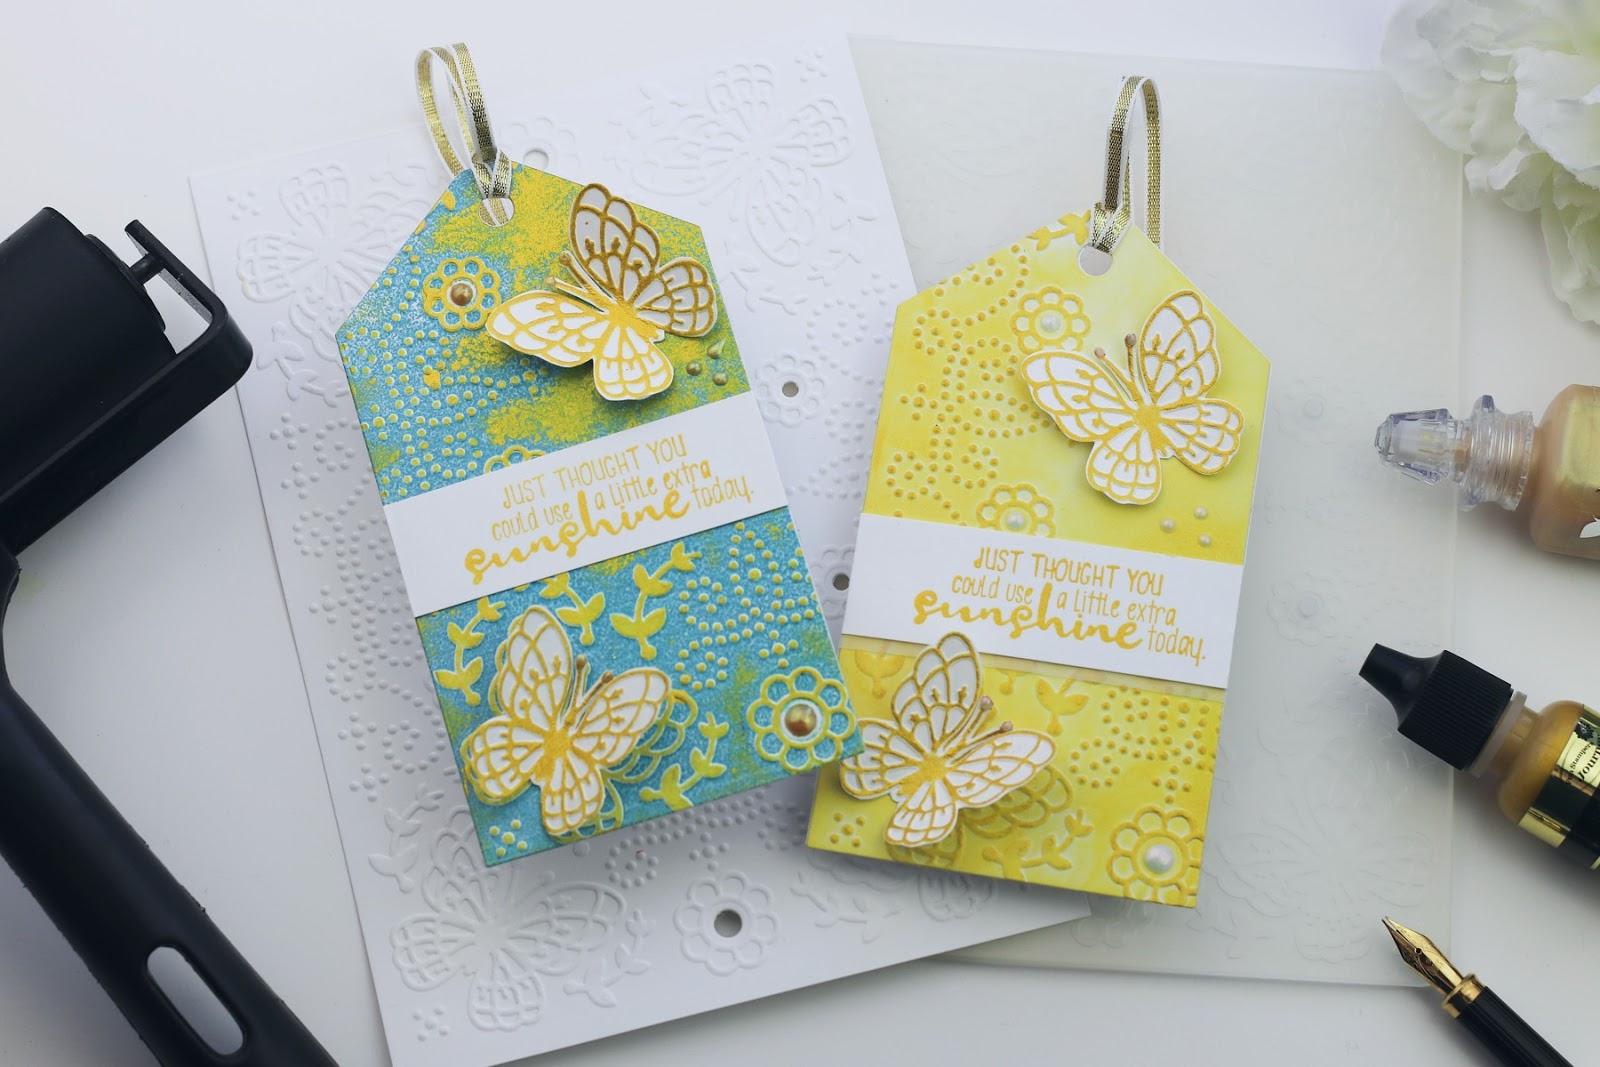 New Cut & Embossed folders by Spellbinders   brayered backgrounds